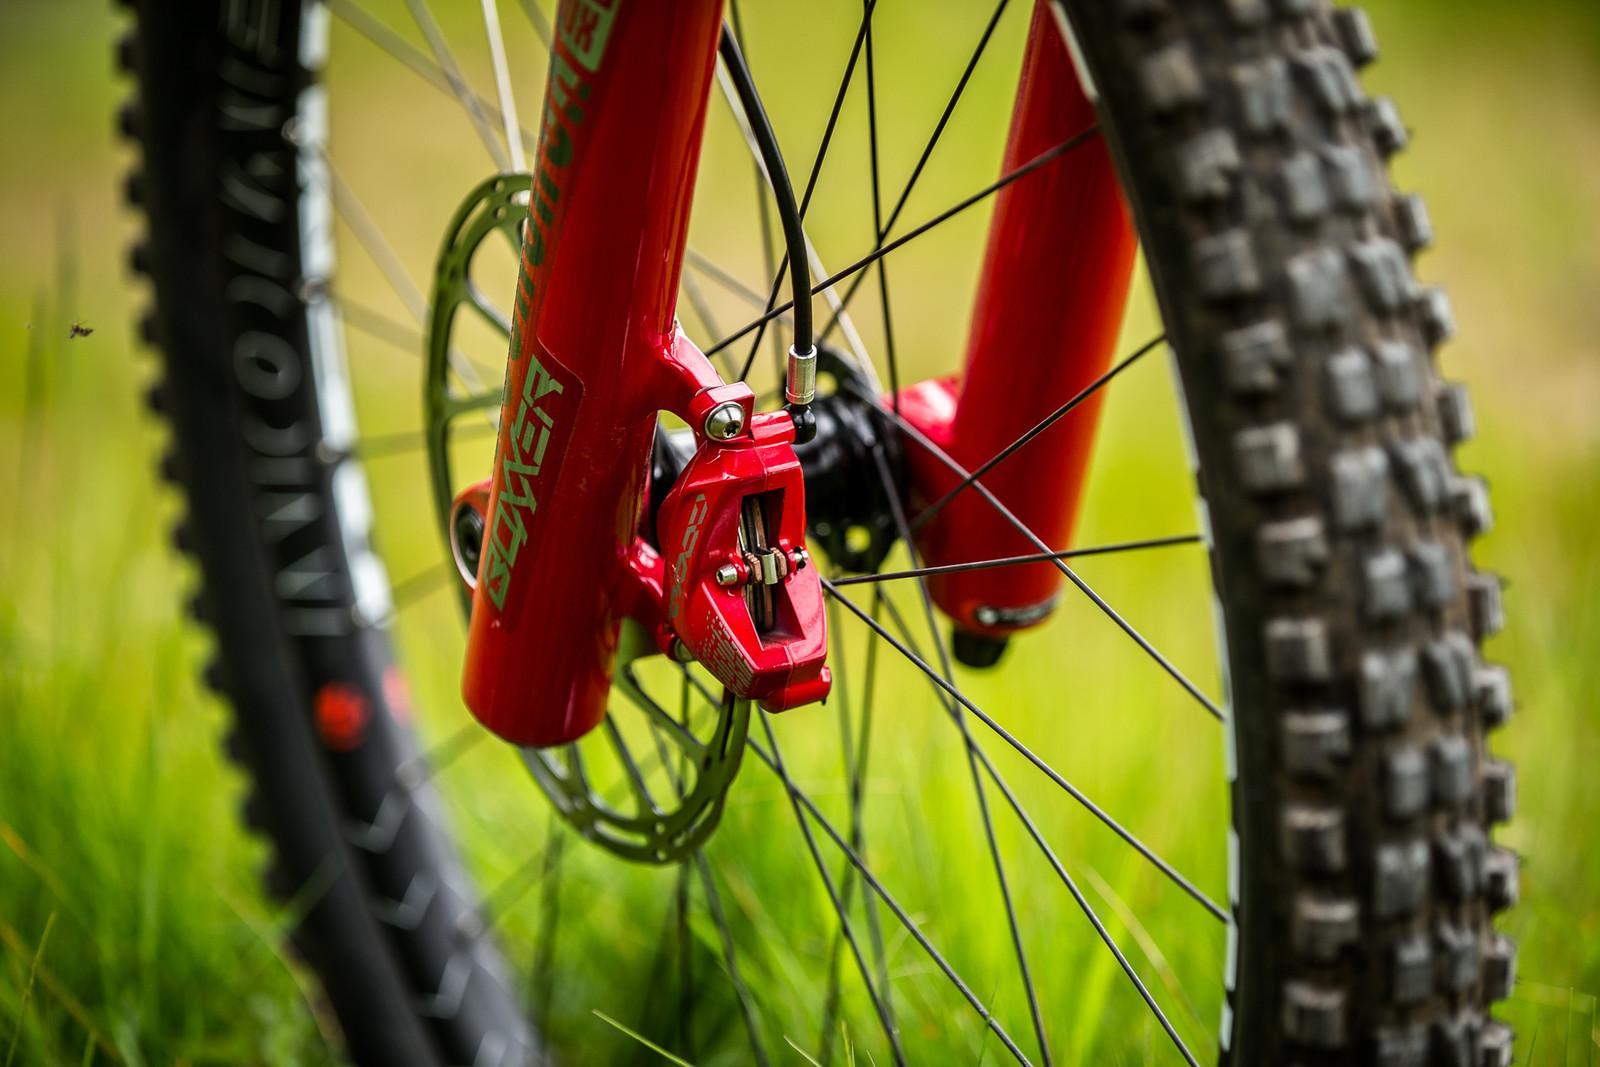 The Red CODE Brakes for BlackBox Riders - Connor Fearon's Kona Supreme Operator for Fort William - Mountain Biking Pictures - Vital MTB